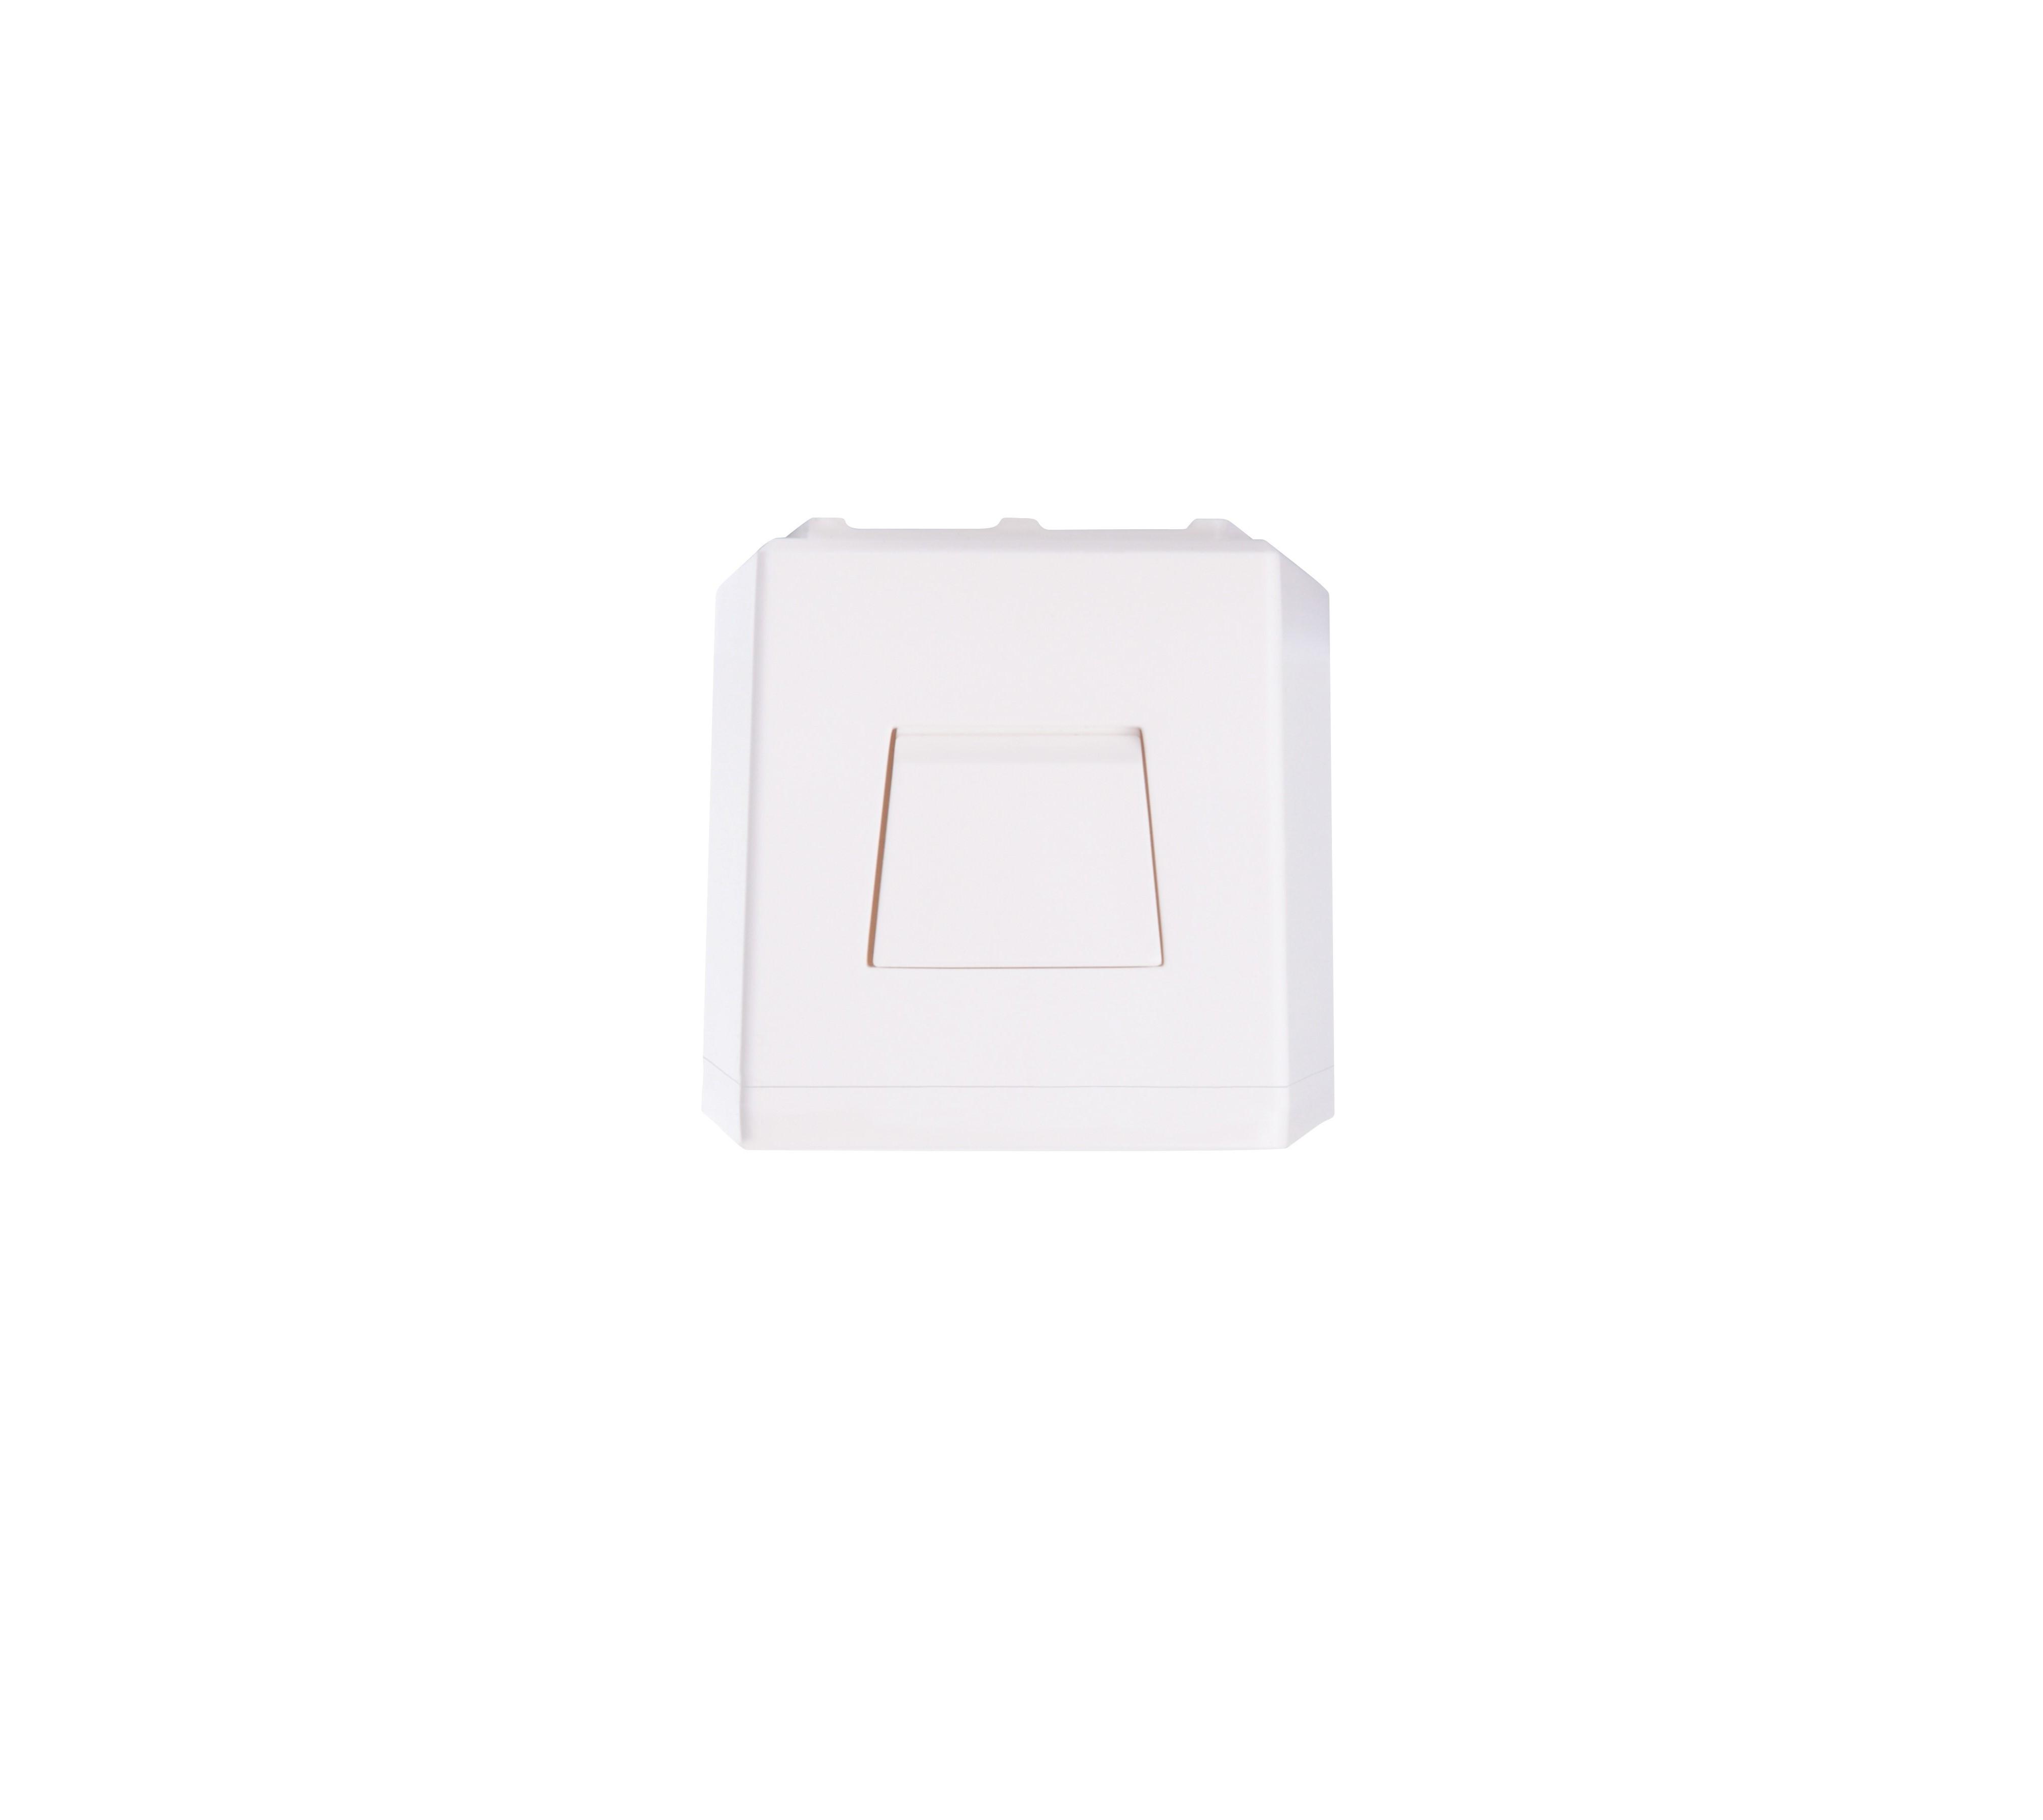 Lampa emergenta led Intelight 94521   3h mentinut test automat 1